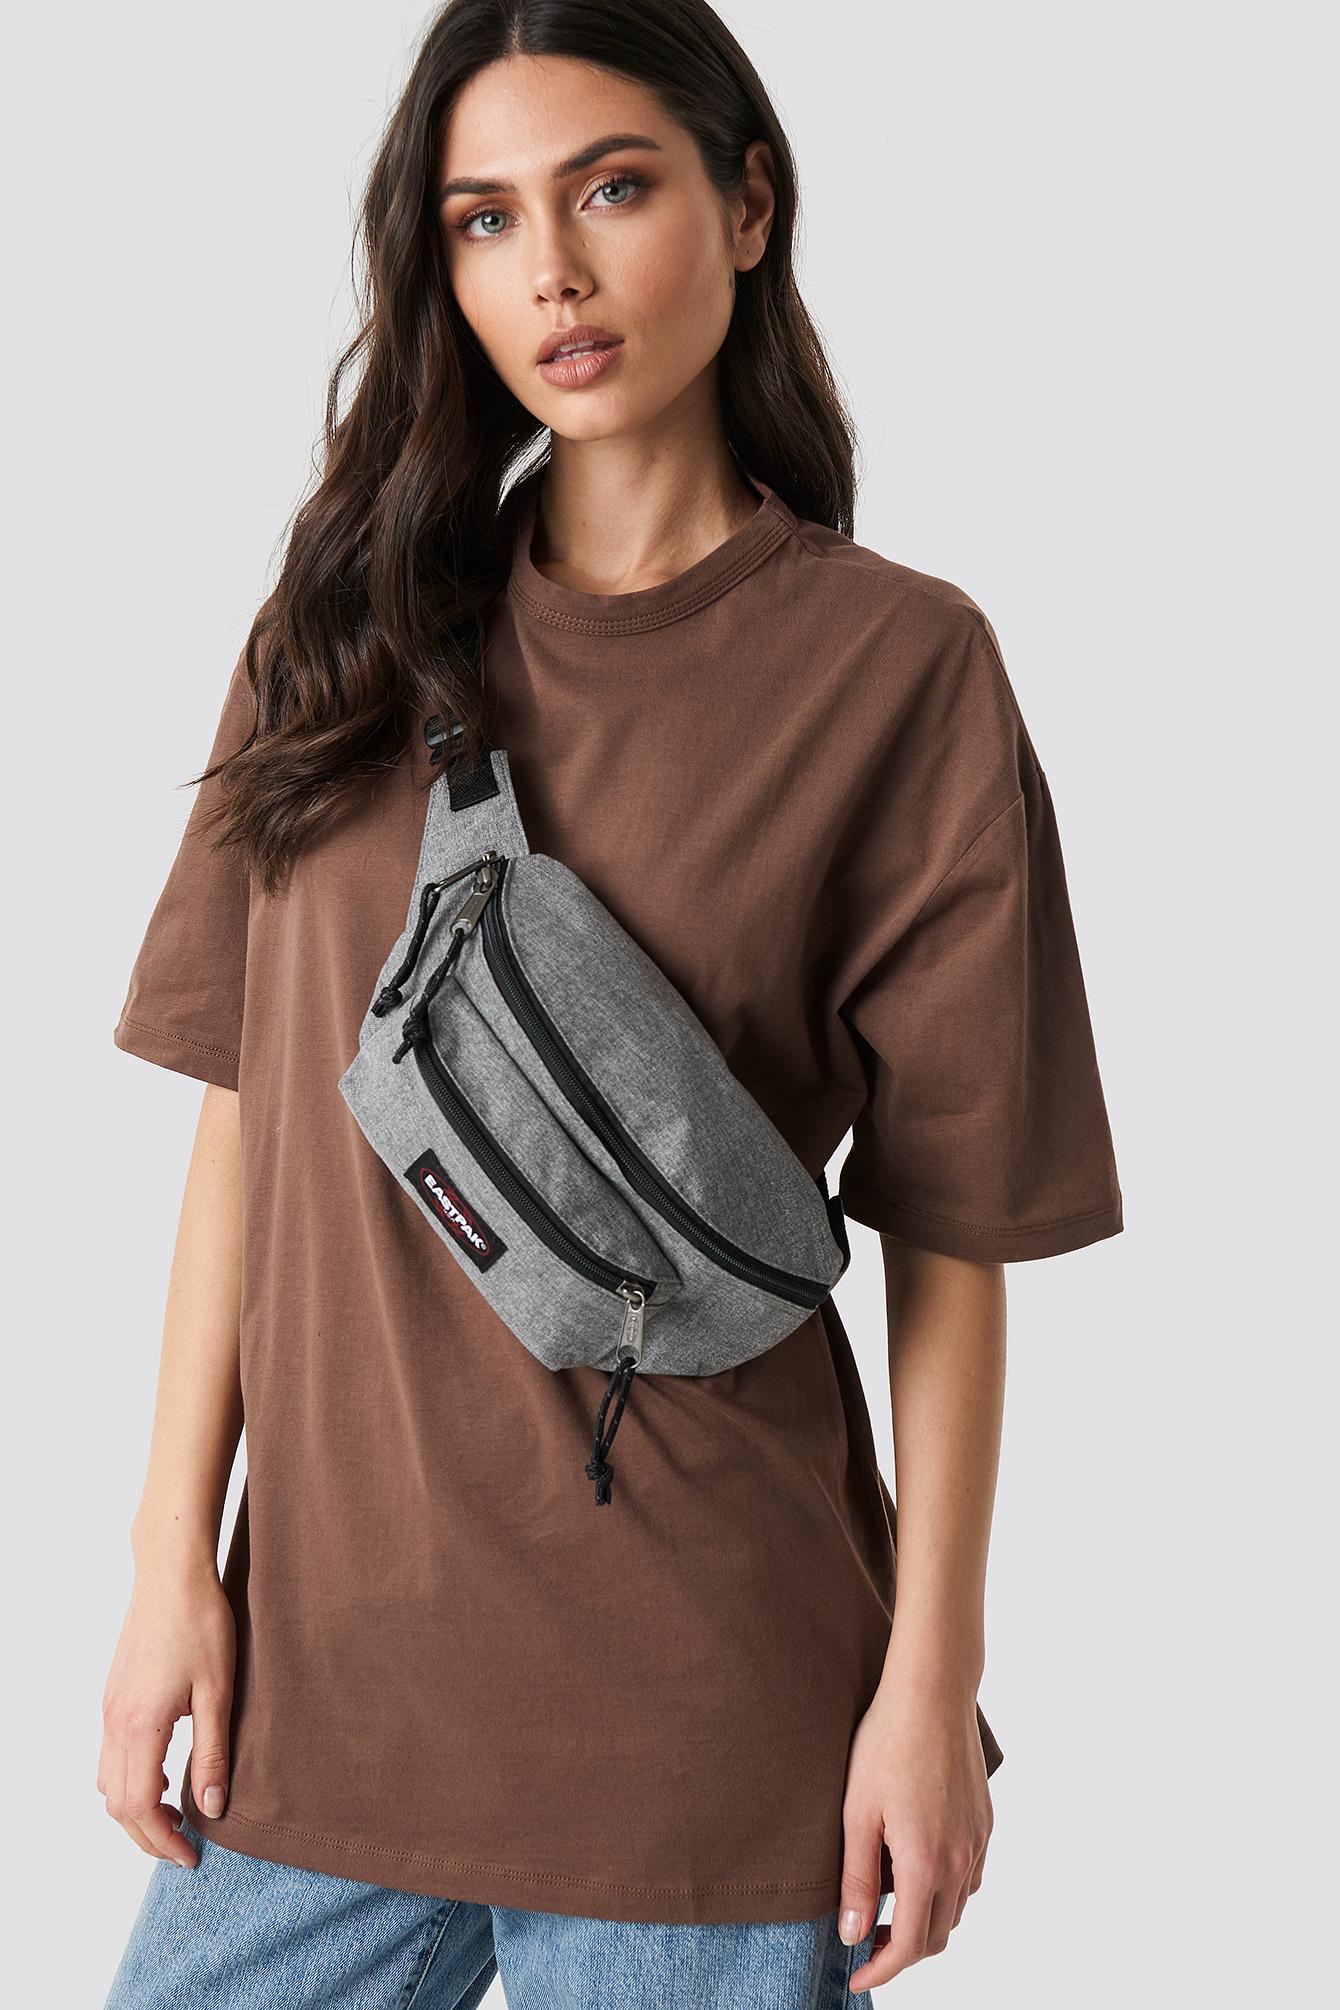 eastpak -  Doggy Bag - Grey